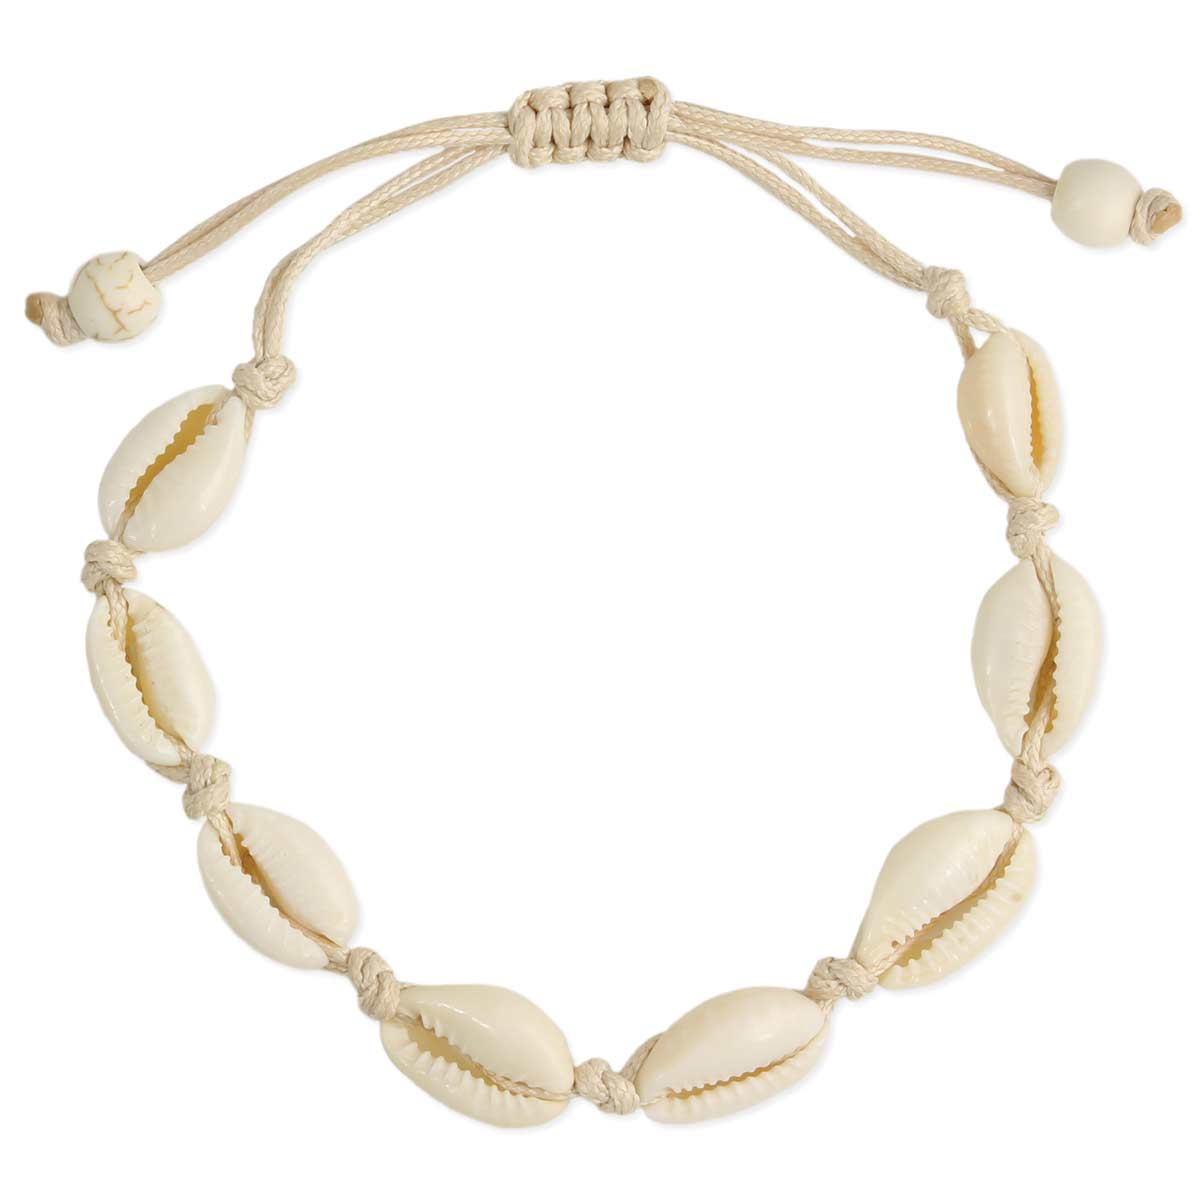 White Cord Cowry Shell Men's Bracelet